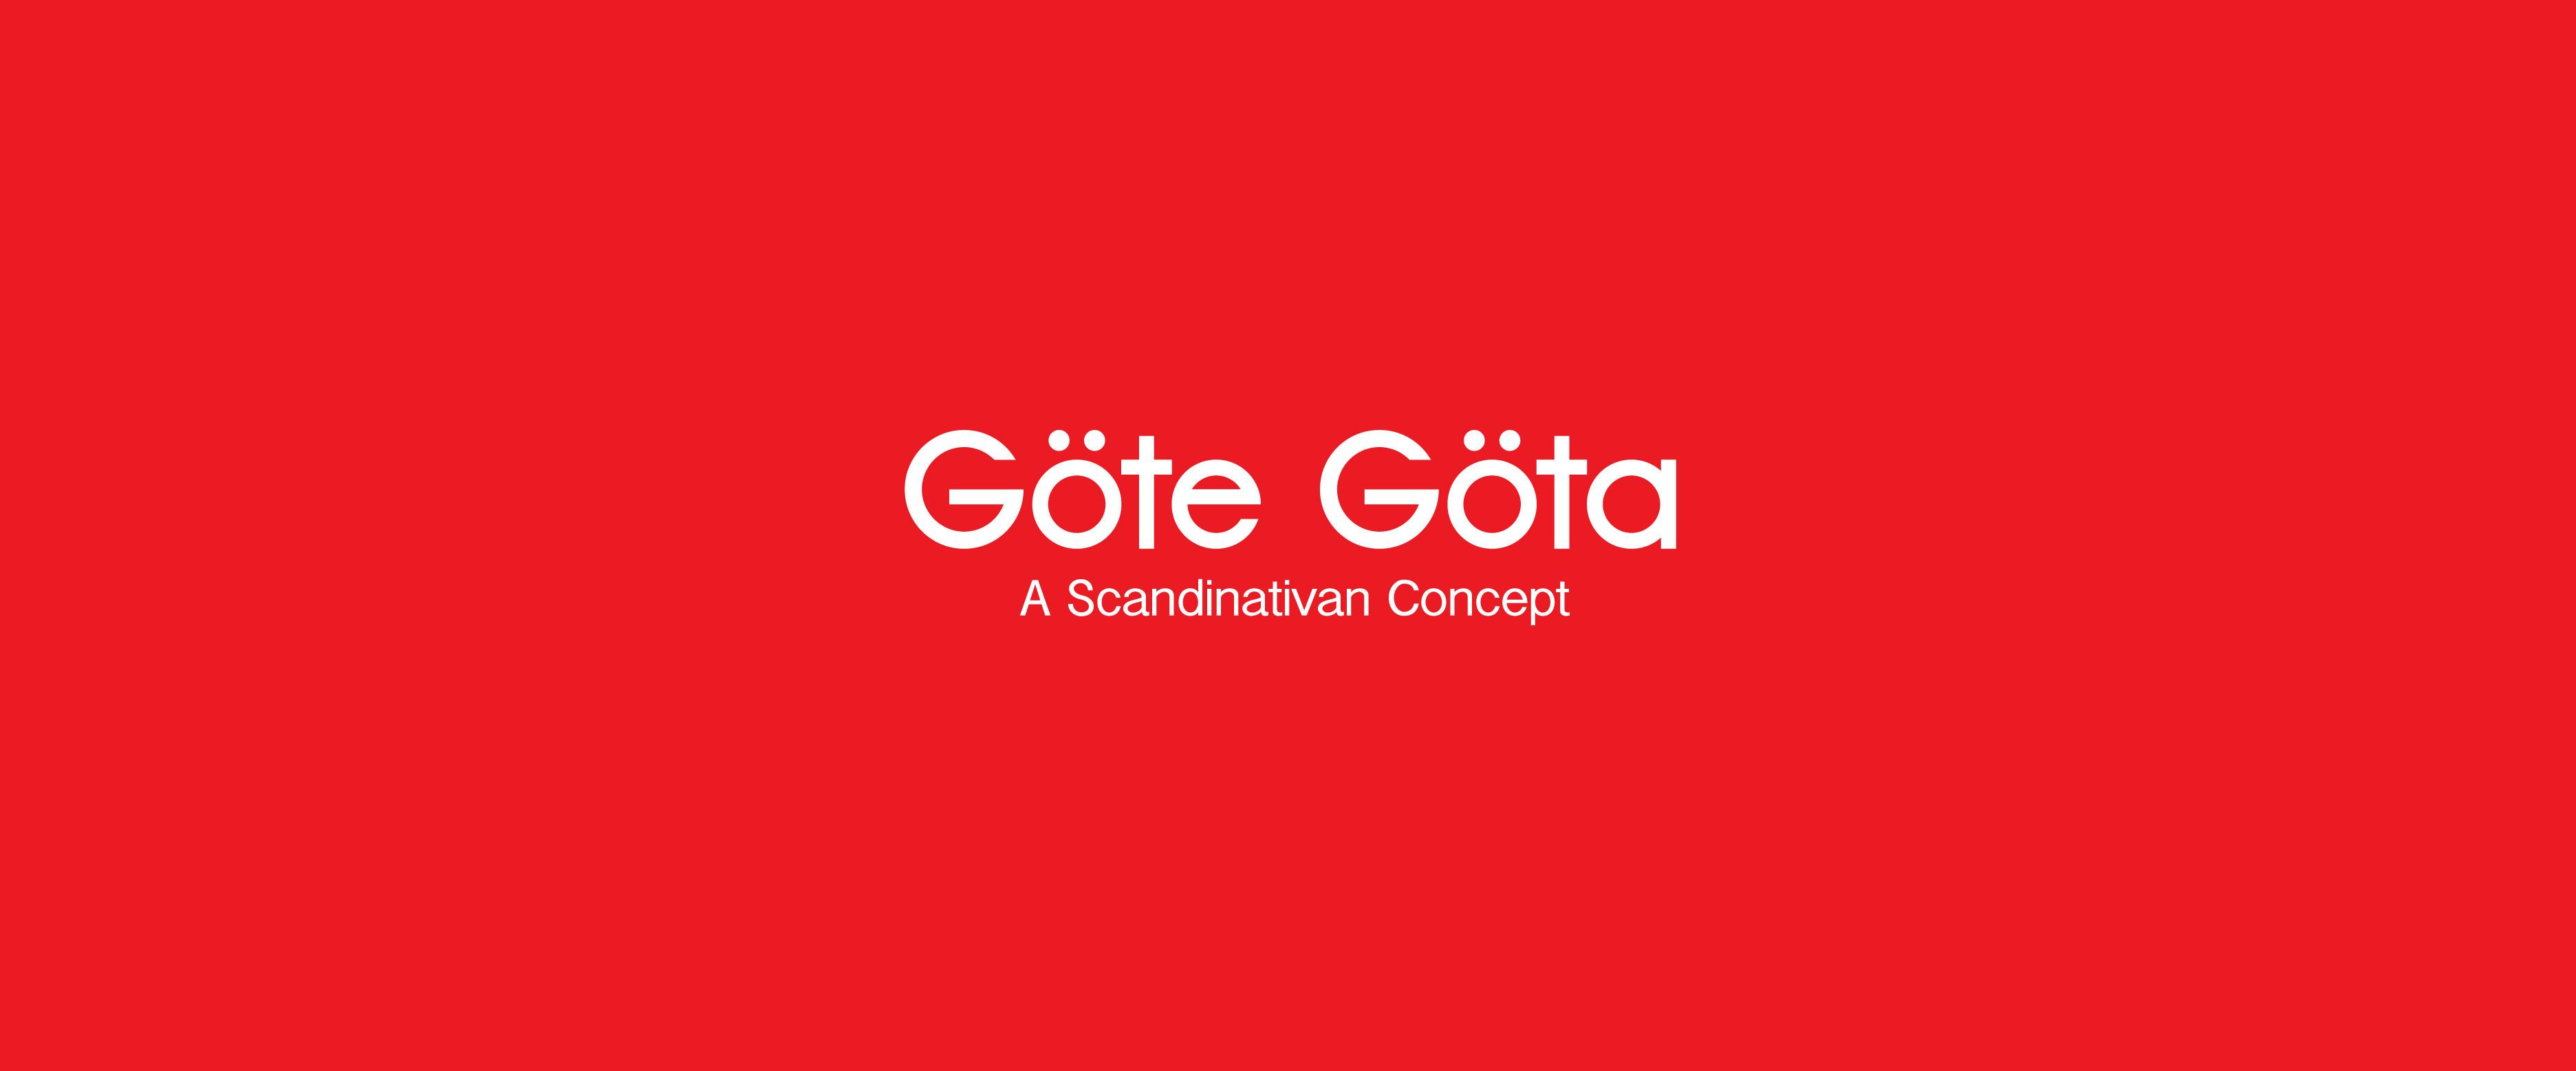 Gote Gota